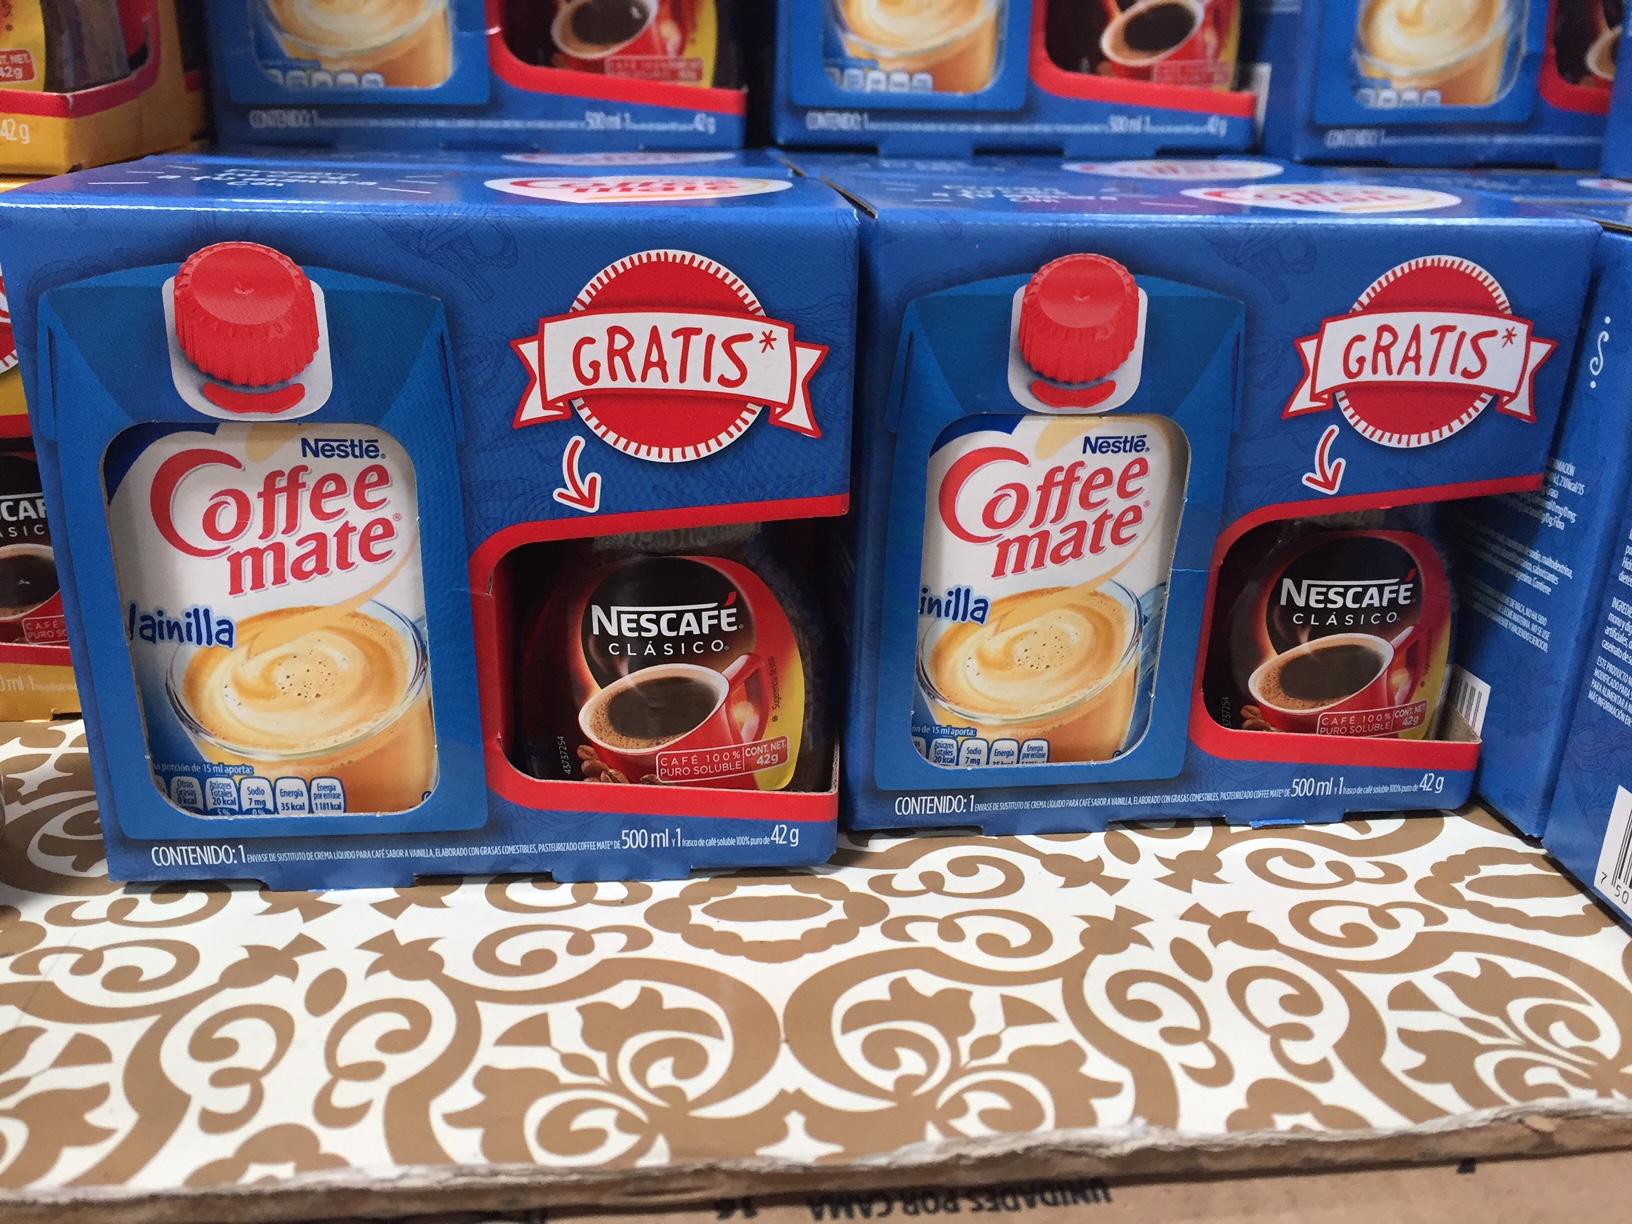 Walmart Zamora, Mich.: Coffe Mate 500 ml $26.00, Gratis Nescafe 60 gr y otras ofertas